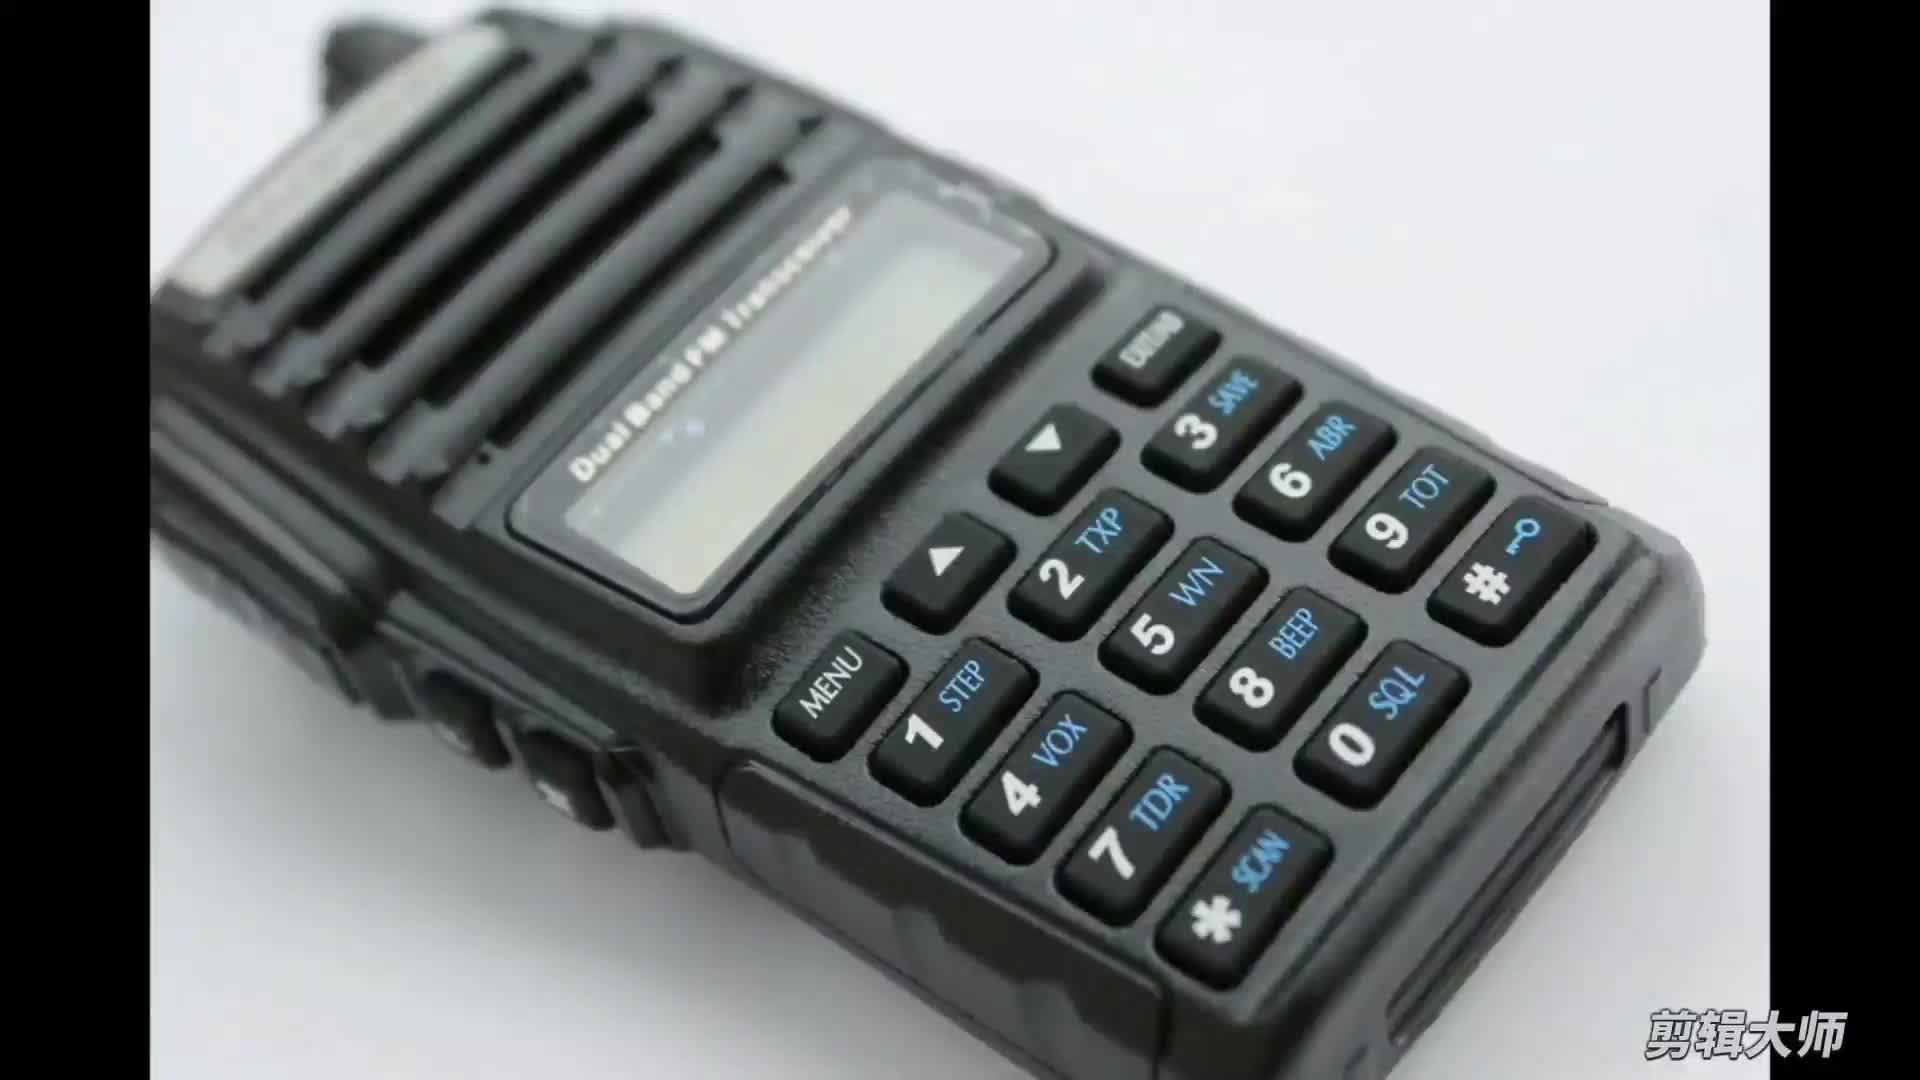 EE. UU. Venta caliente de largo alcance Baofeng UV-82 UHF, VHF 10 W Walkie Talkie baofeng uv82 China mejor fabricante